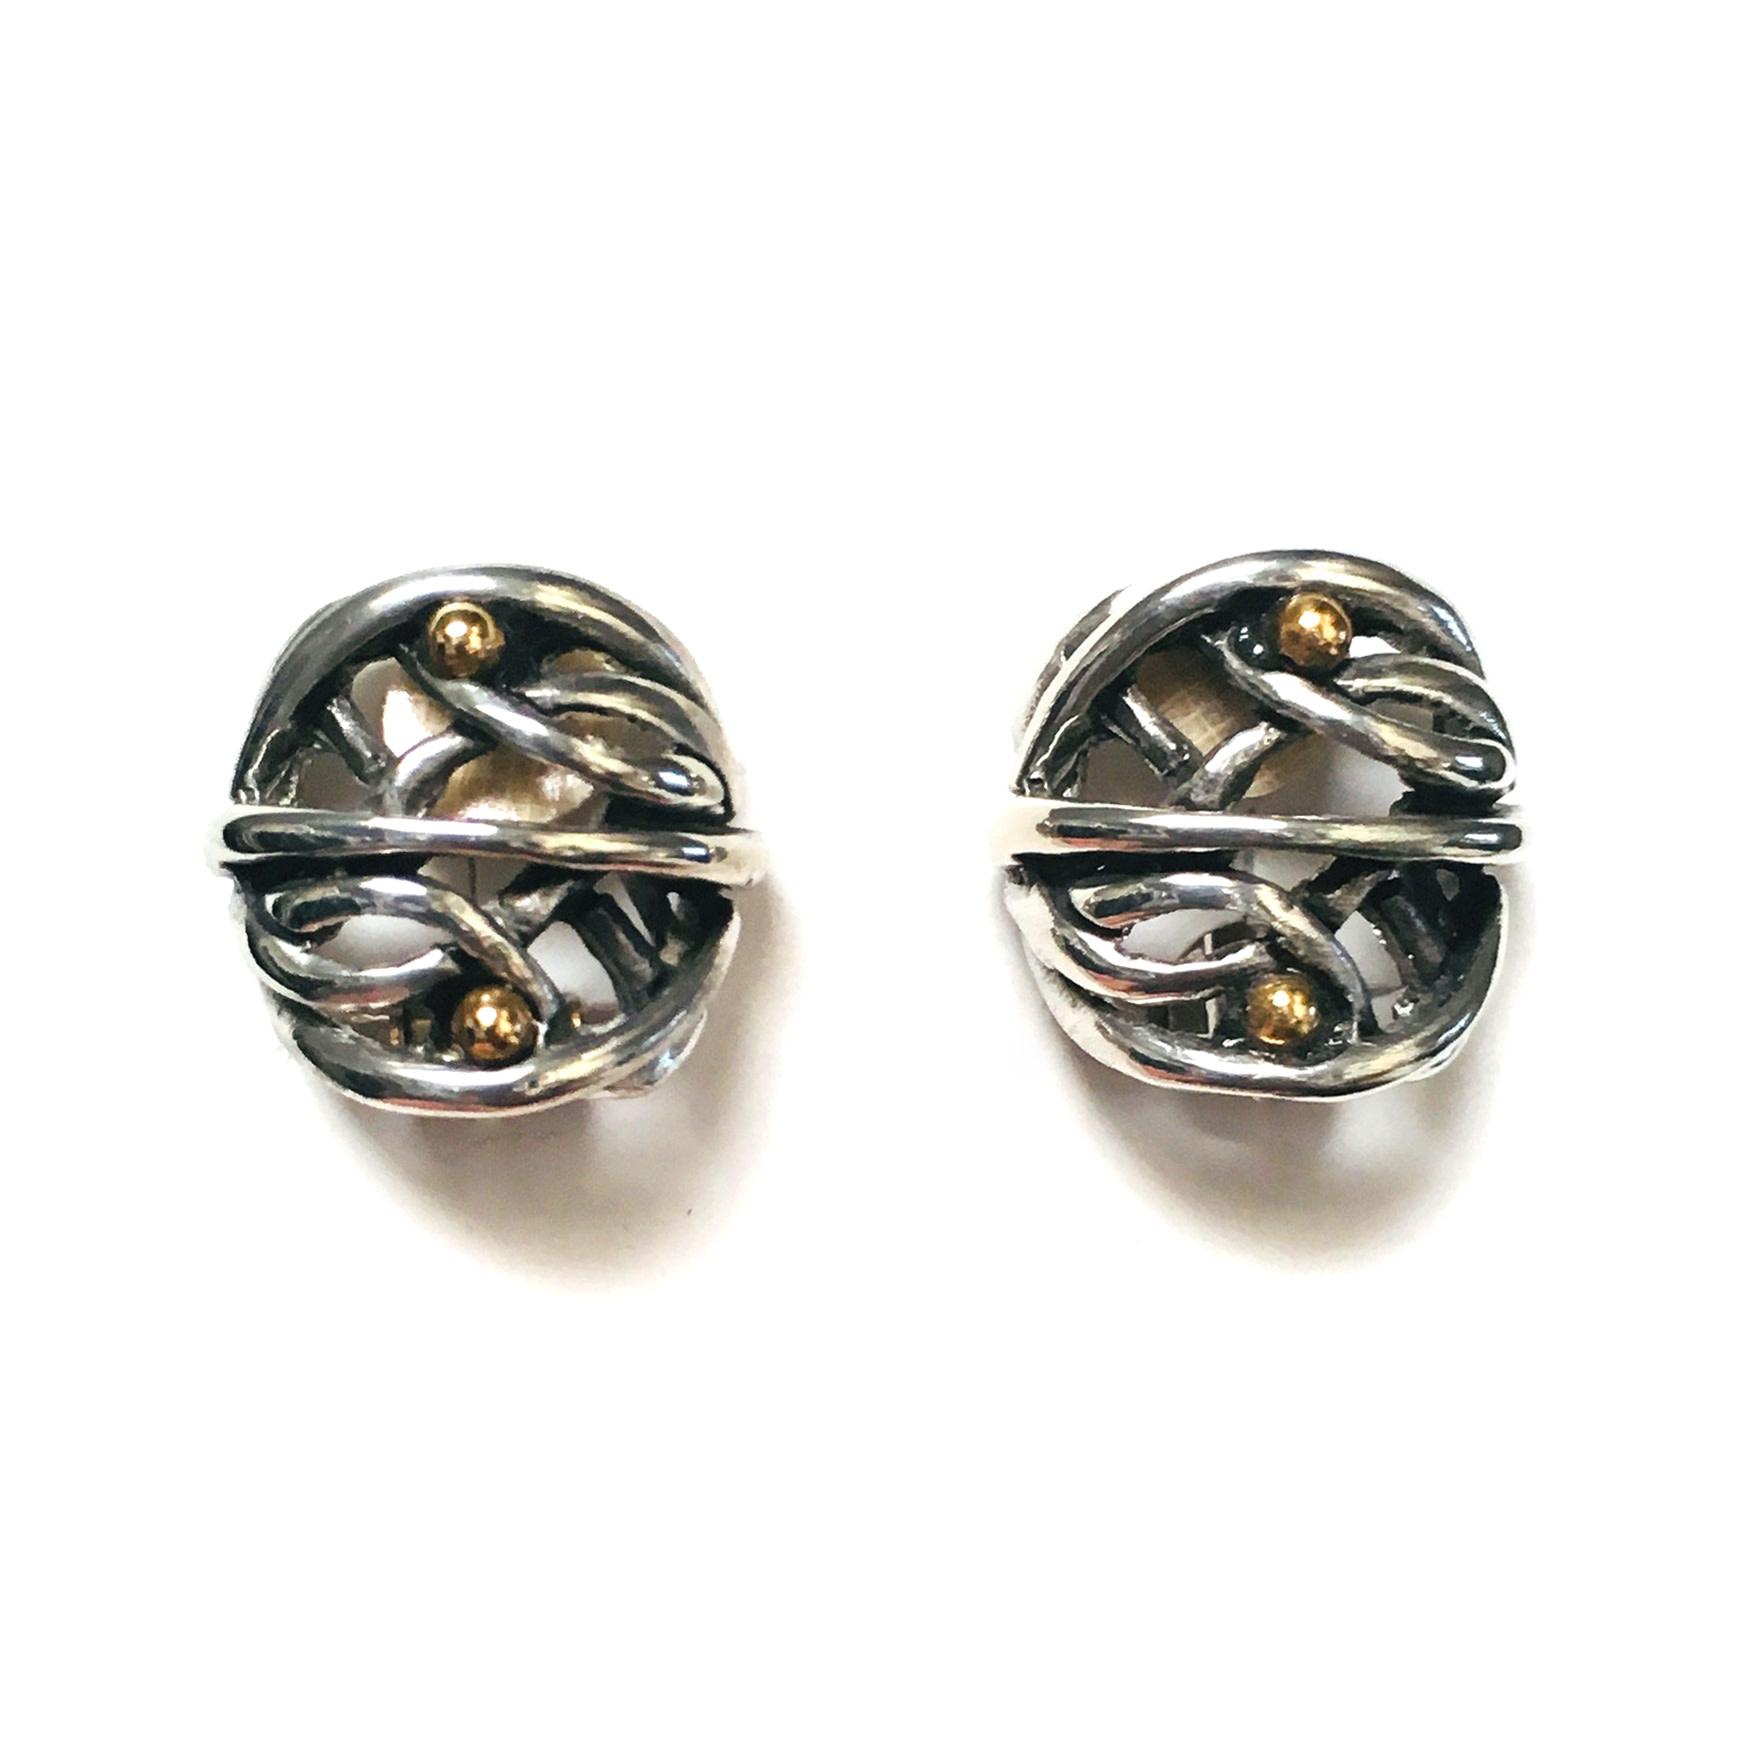 Fahrenheit Fahrenheit Tangle Earrings